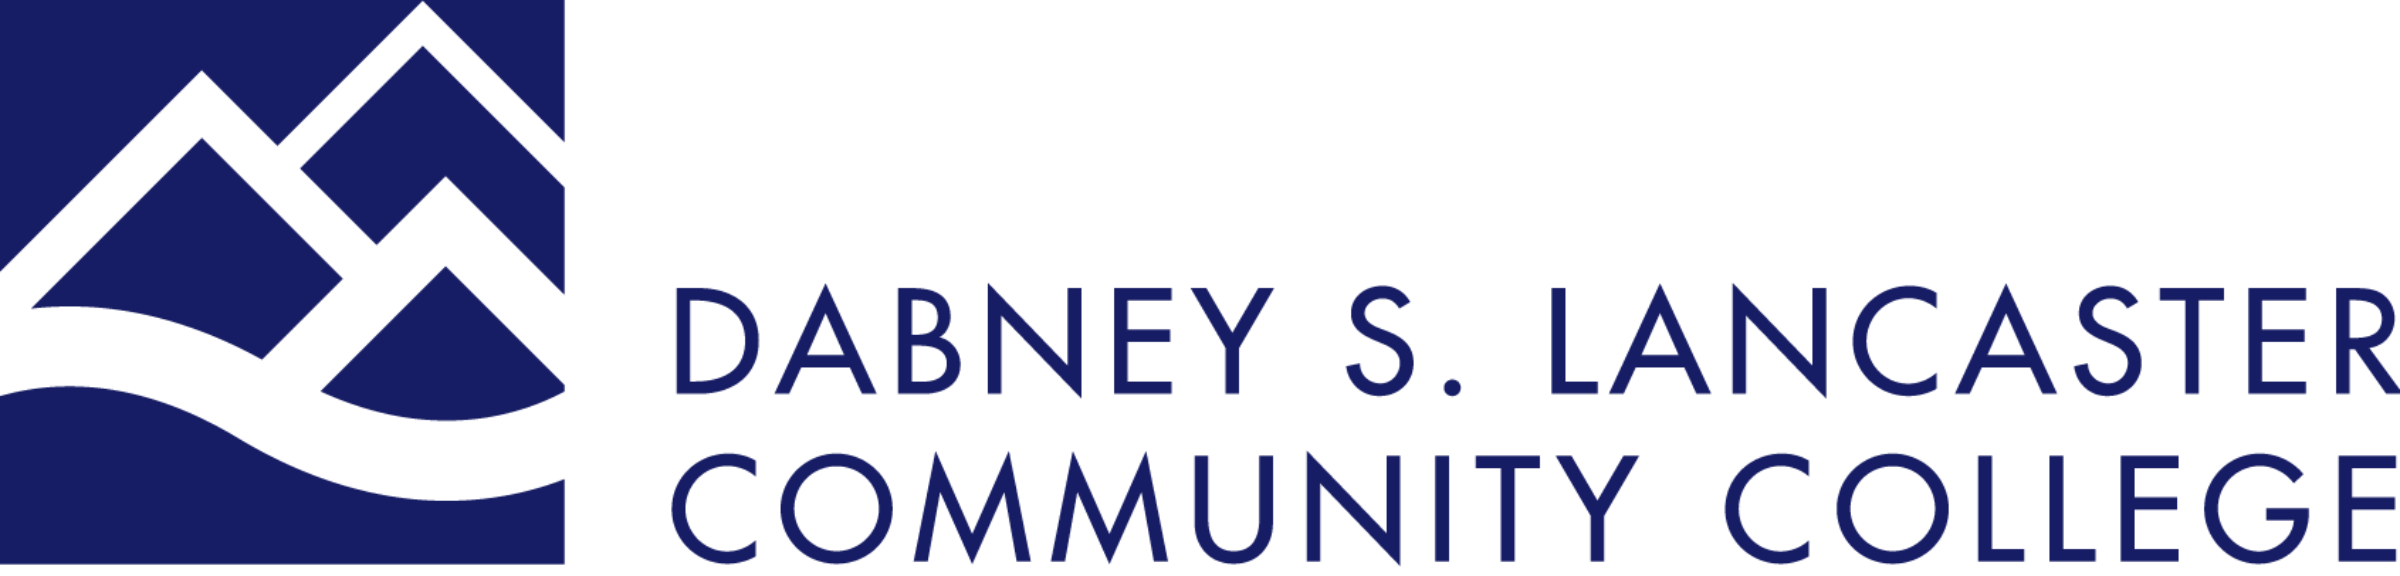 dabney s lancaster community college logo